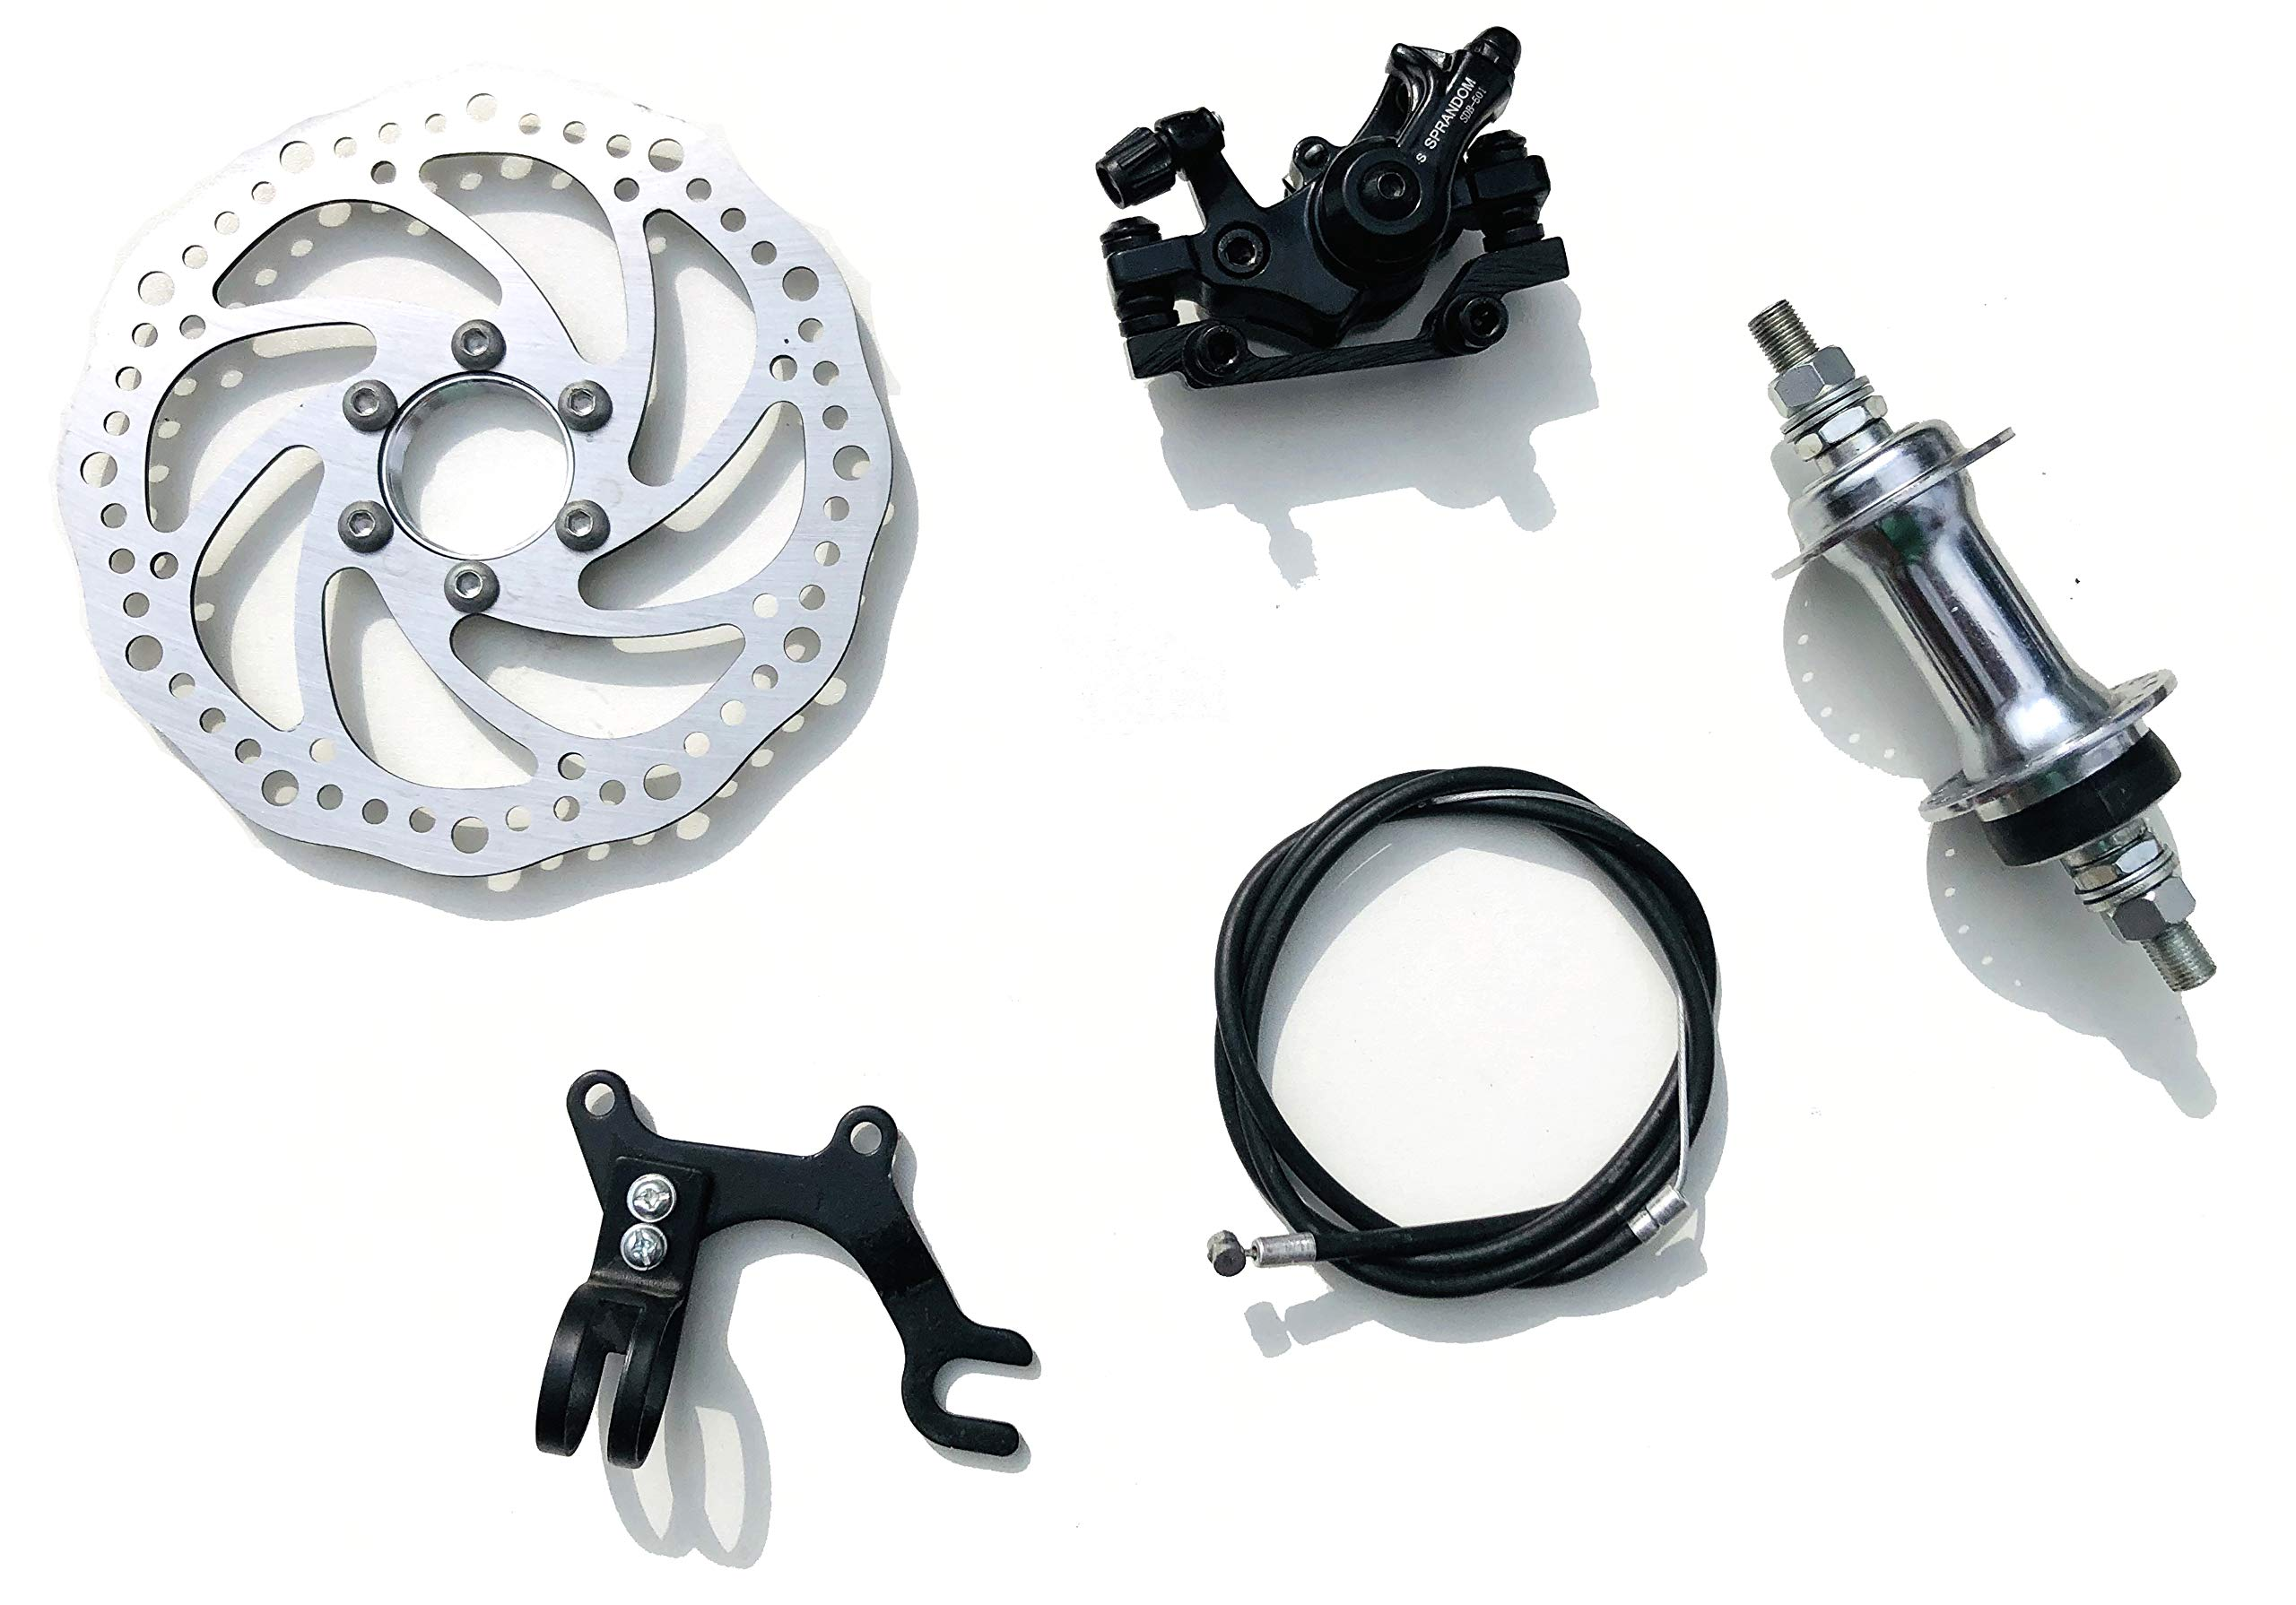 Universal Mechanical Disc Brake MTB Bike Cycling Bicycle Caliper G3 160mm Rotor